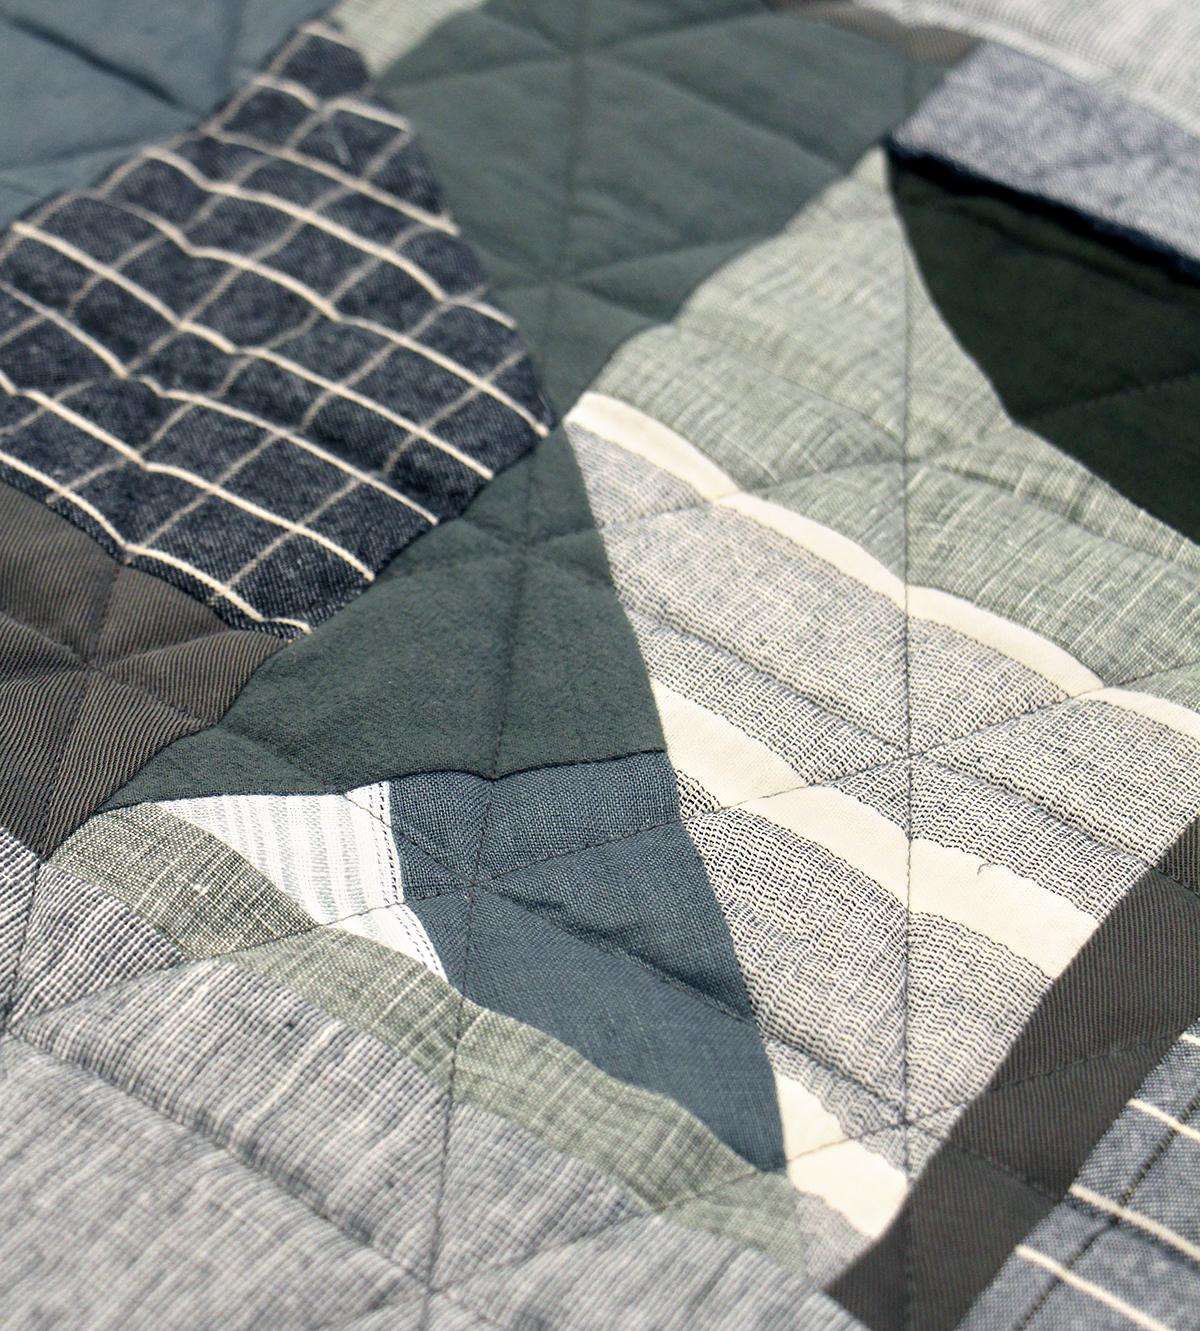 Megan Nielsen Patterns | Hovea Sewalong: Scrap Quilting | Intersecting Lines